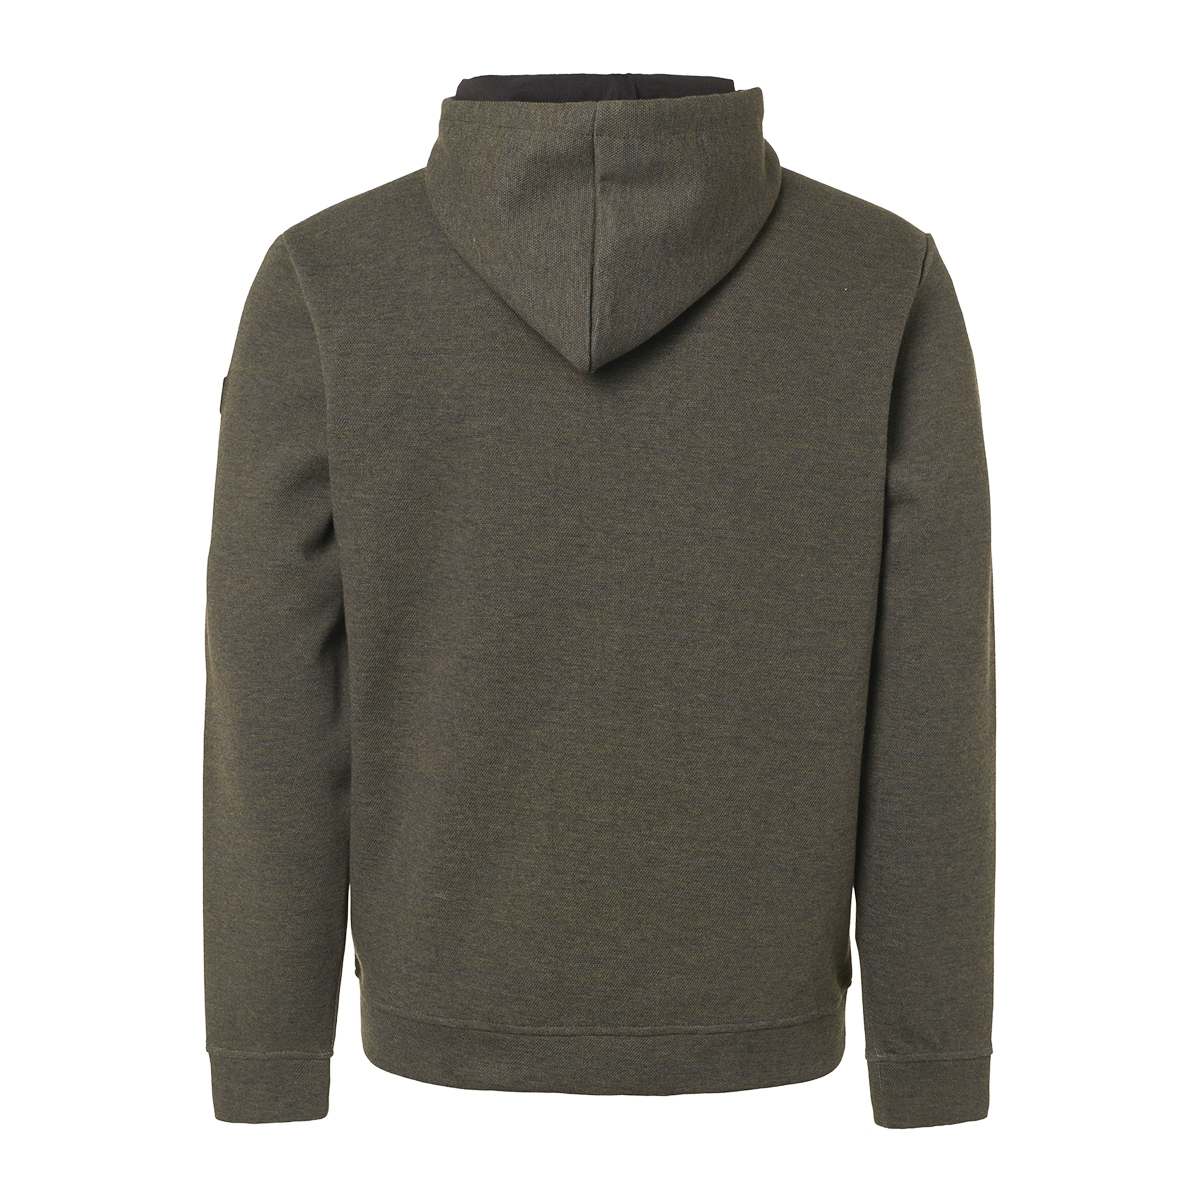 full zip hooded cardigan 92100929 no-excess vest 059